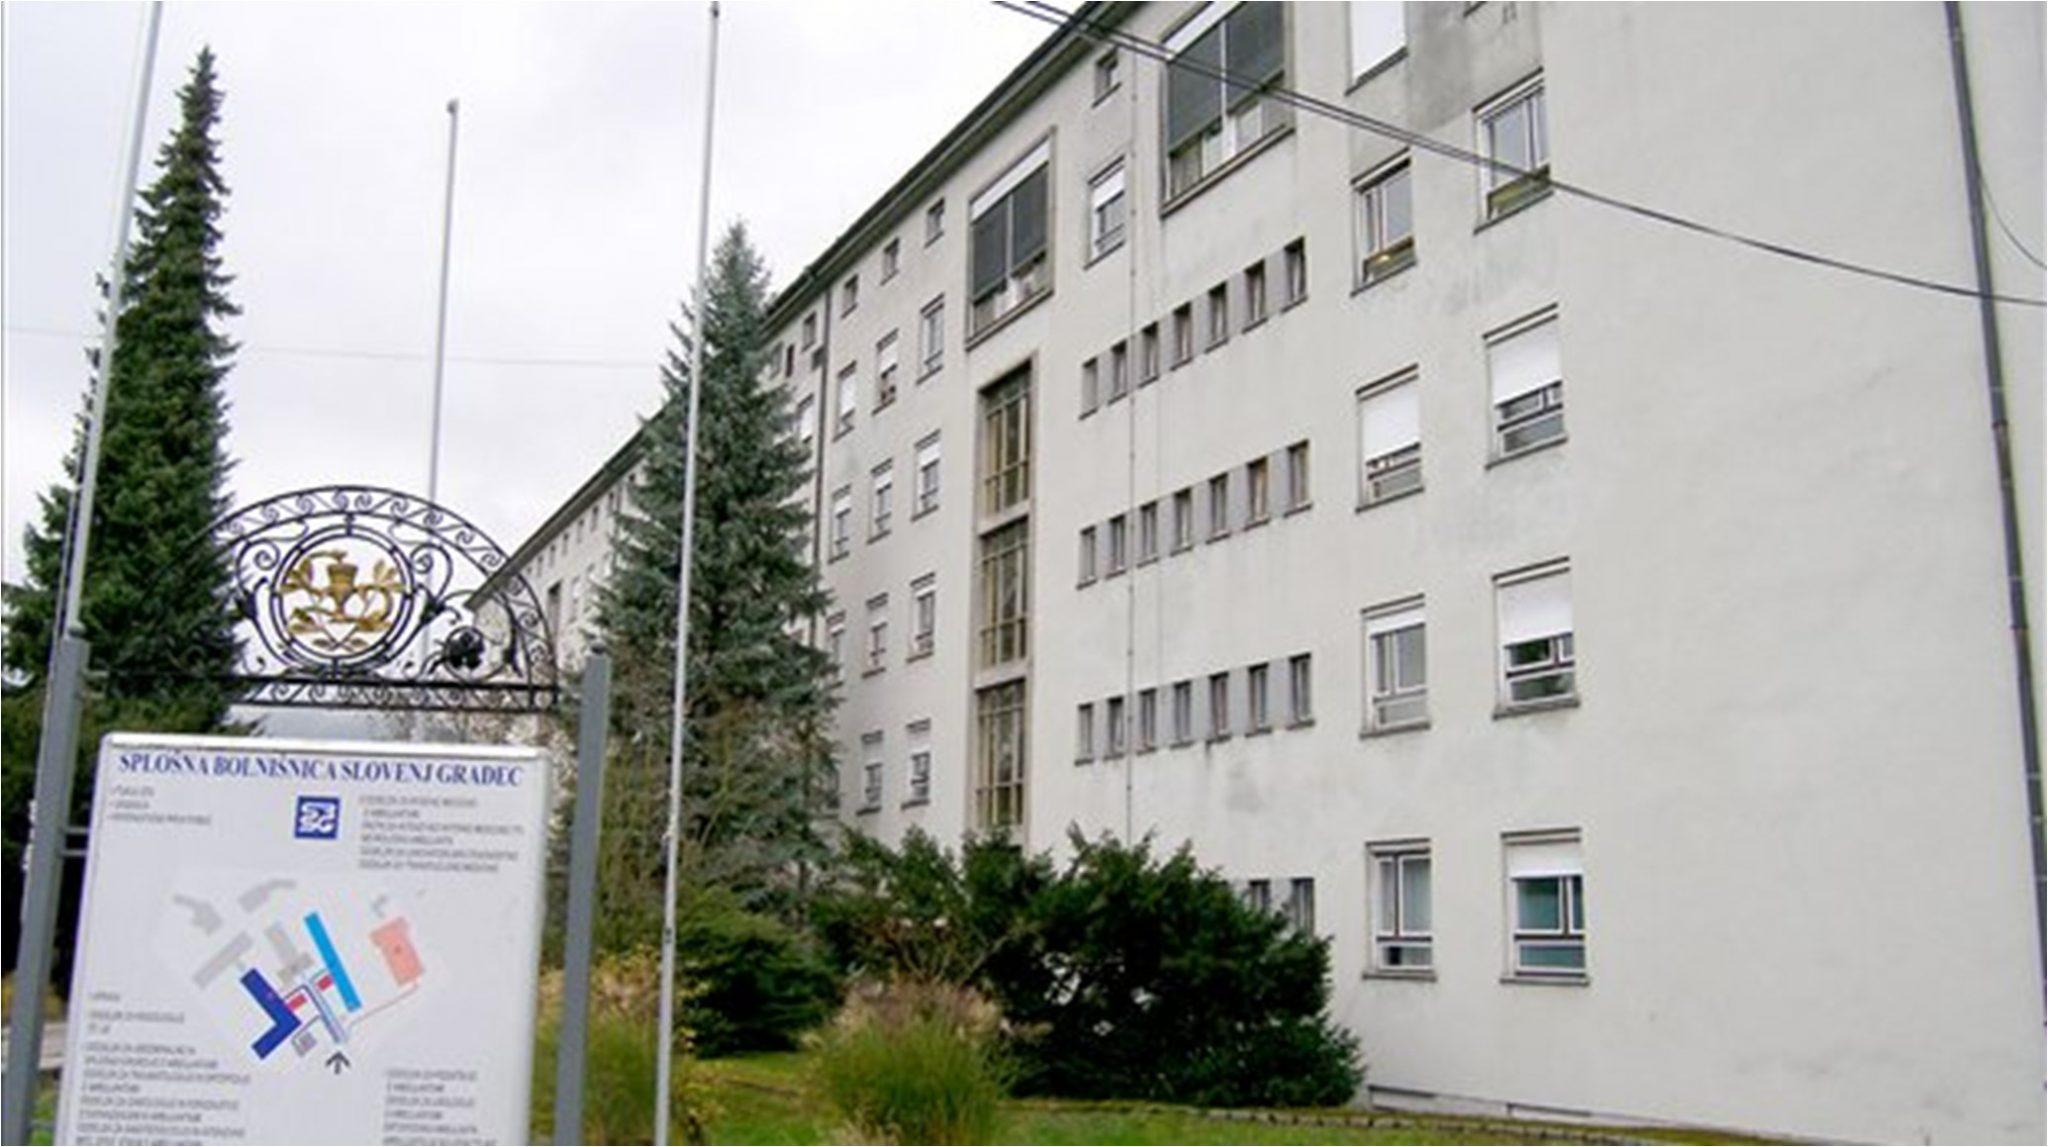 General Hospital Slovenj Gradec – Energy renovation